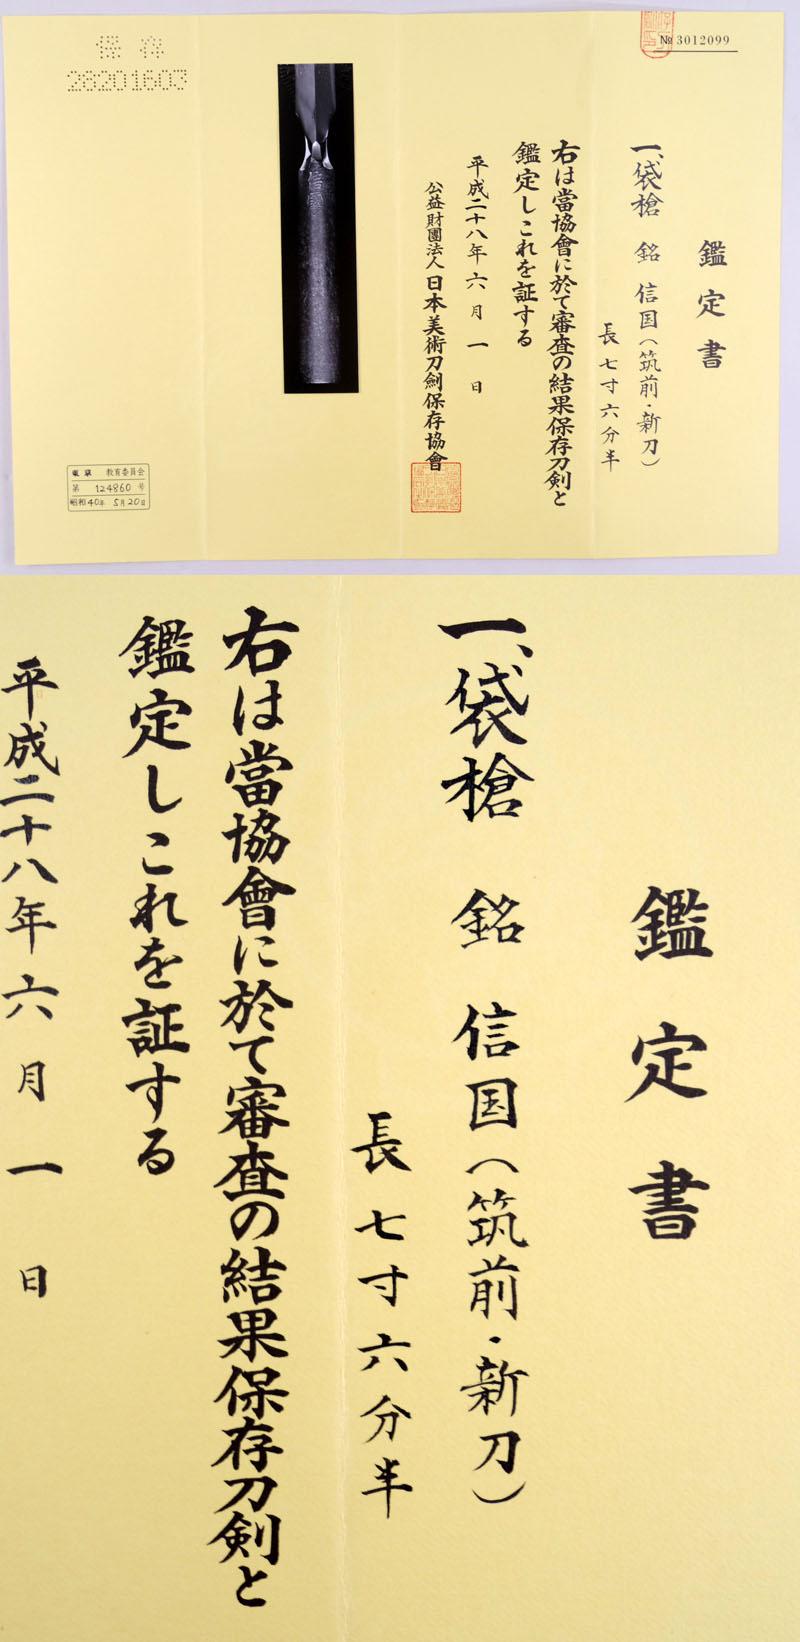 信国(筑前・新刀) Picture of Certificate